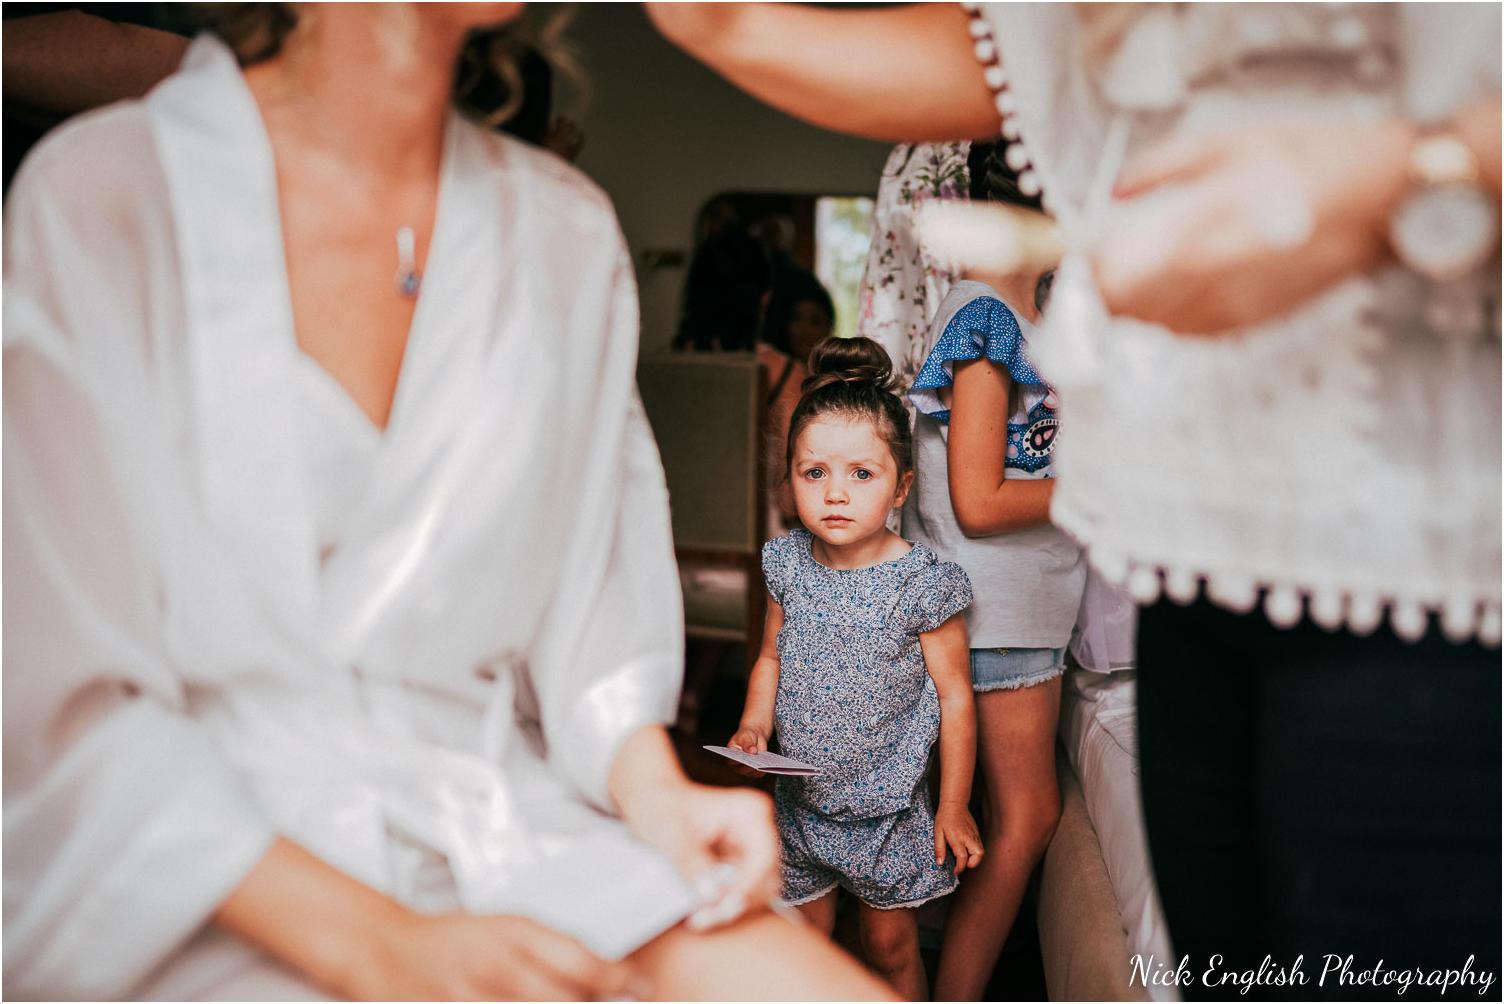 Destination_Wedding_Photographer_Slovenia_Nick_English_Photography-21.jpg